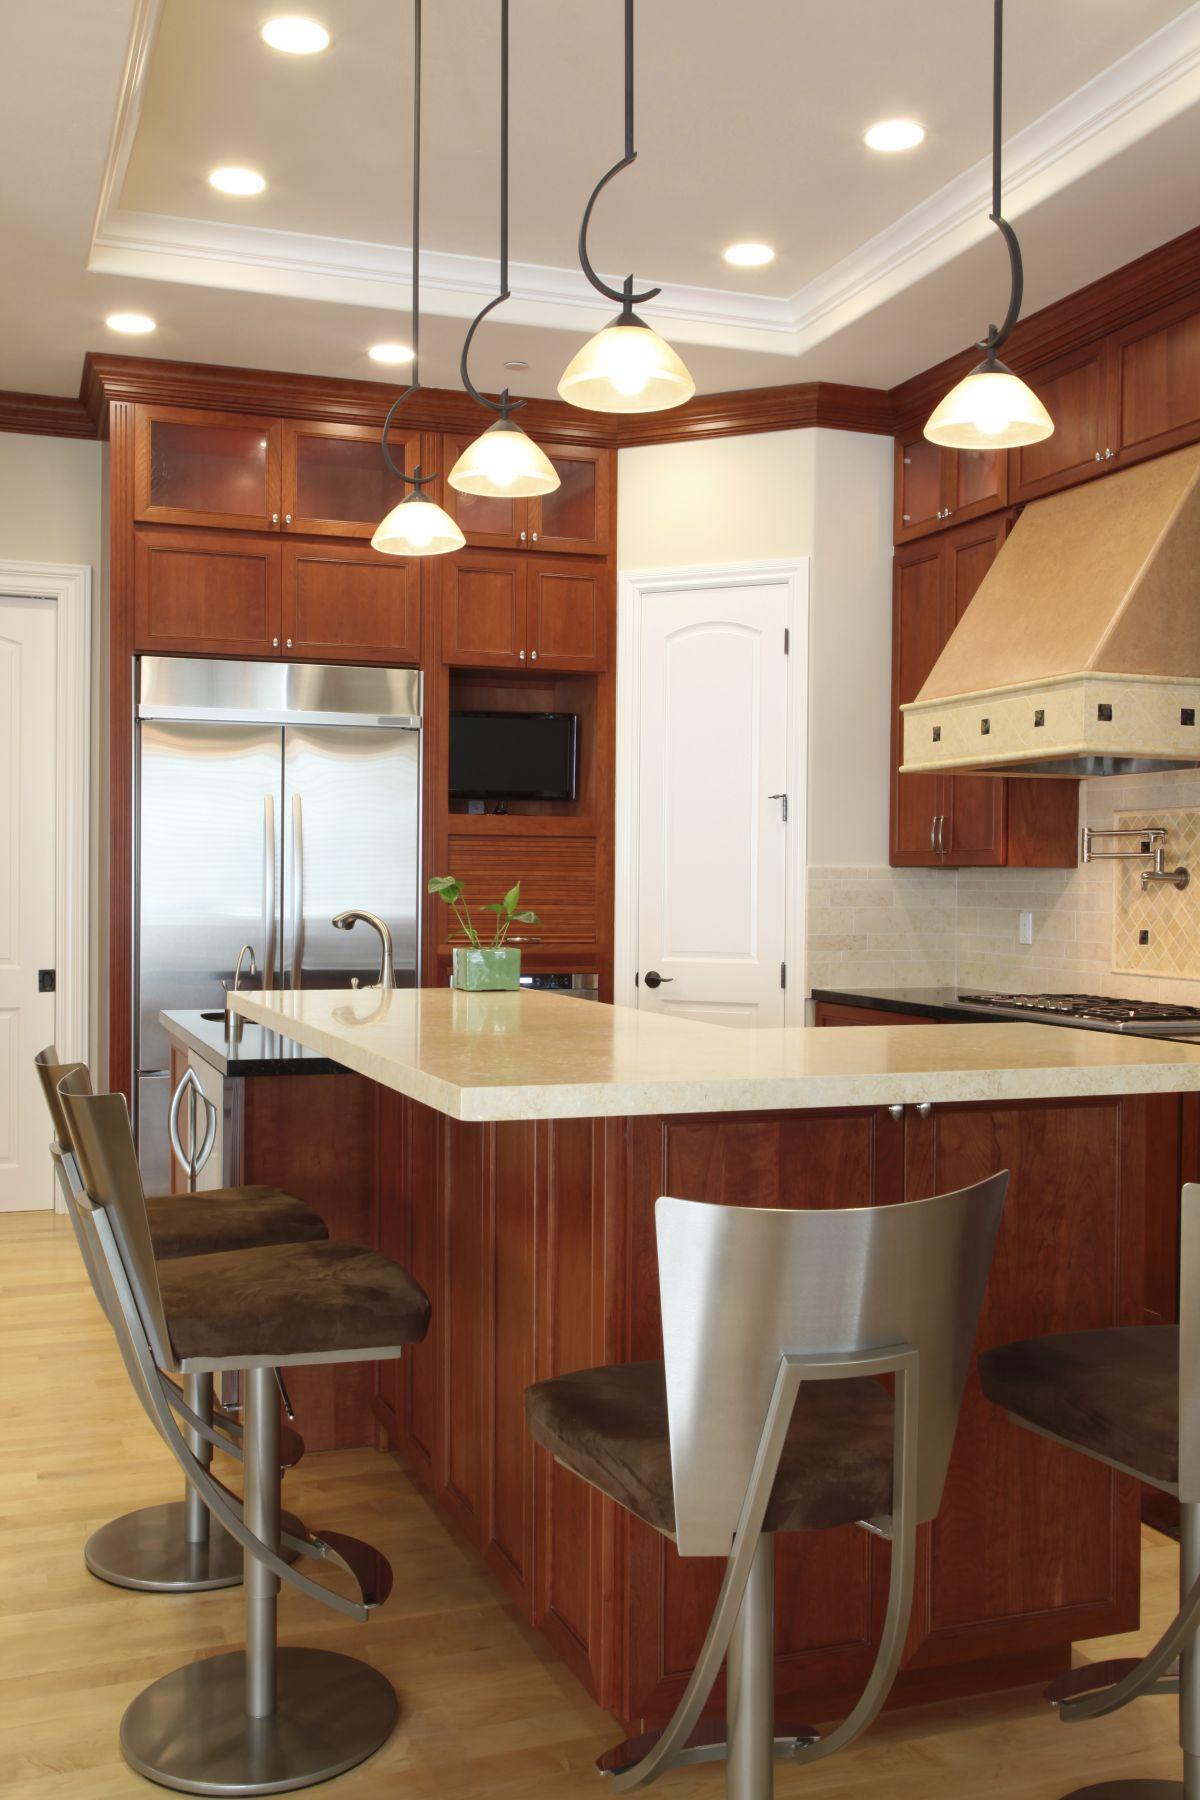 Interior renovation for the kitchen